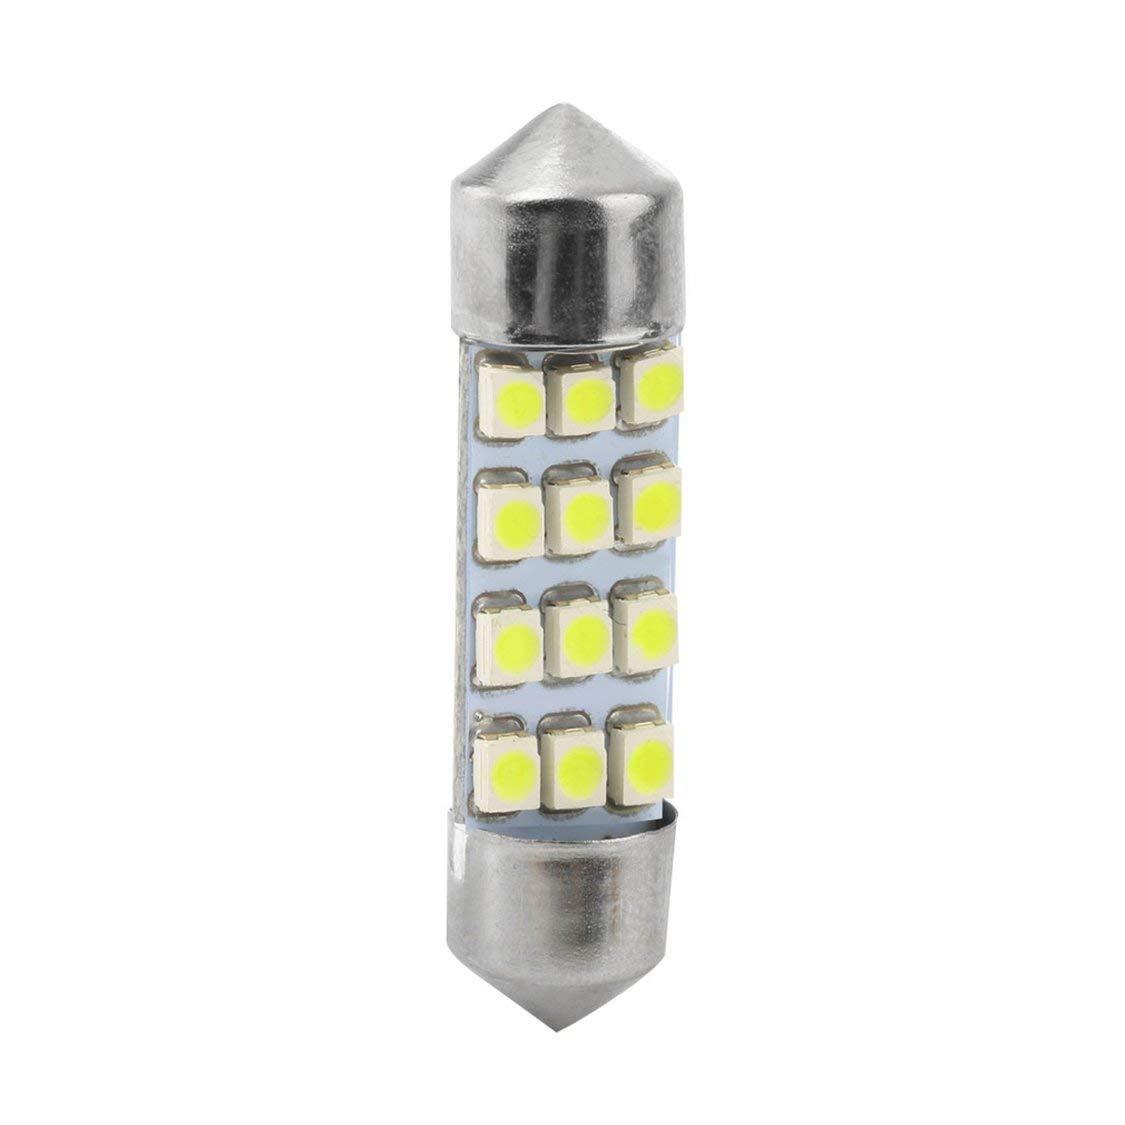 1pc 42mm C5W C10W SV8.5 9 led 5630 smd Festoon CANBUS NO Error Luz de la placa de matr/ícula del coche L/ámparas de c/úpula autom/áticas Luces de lectura 12V